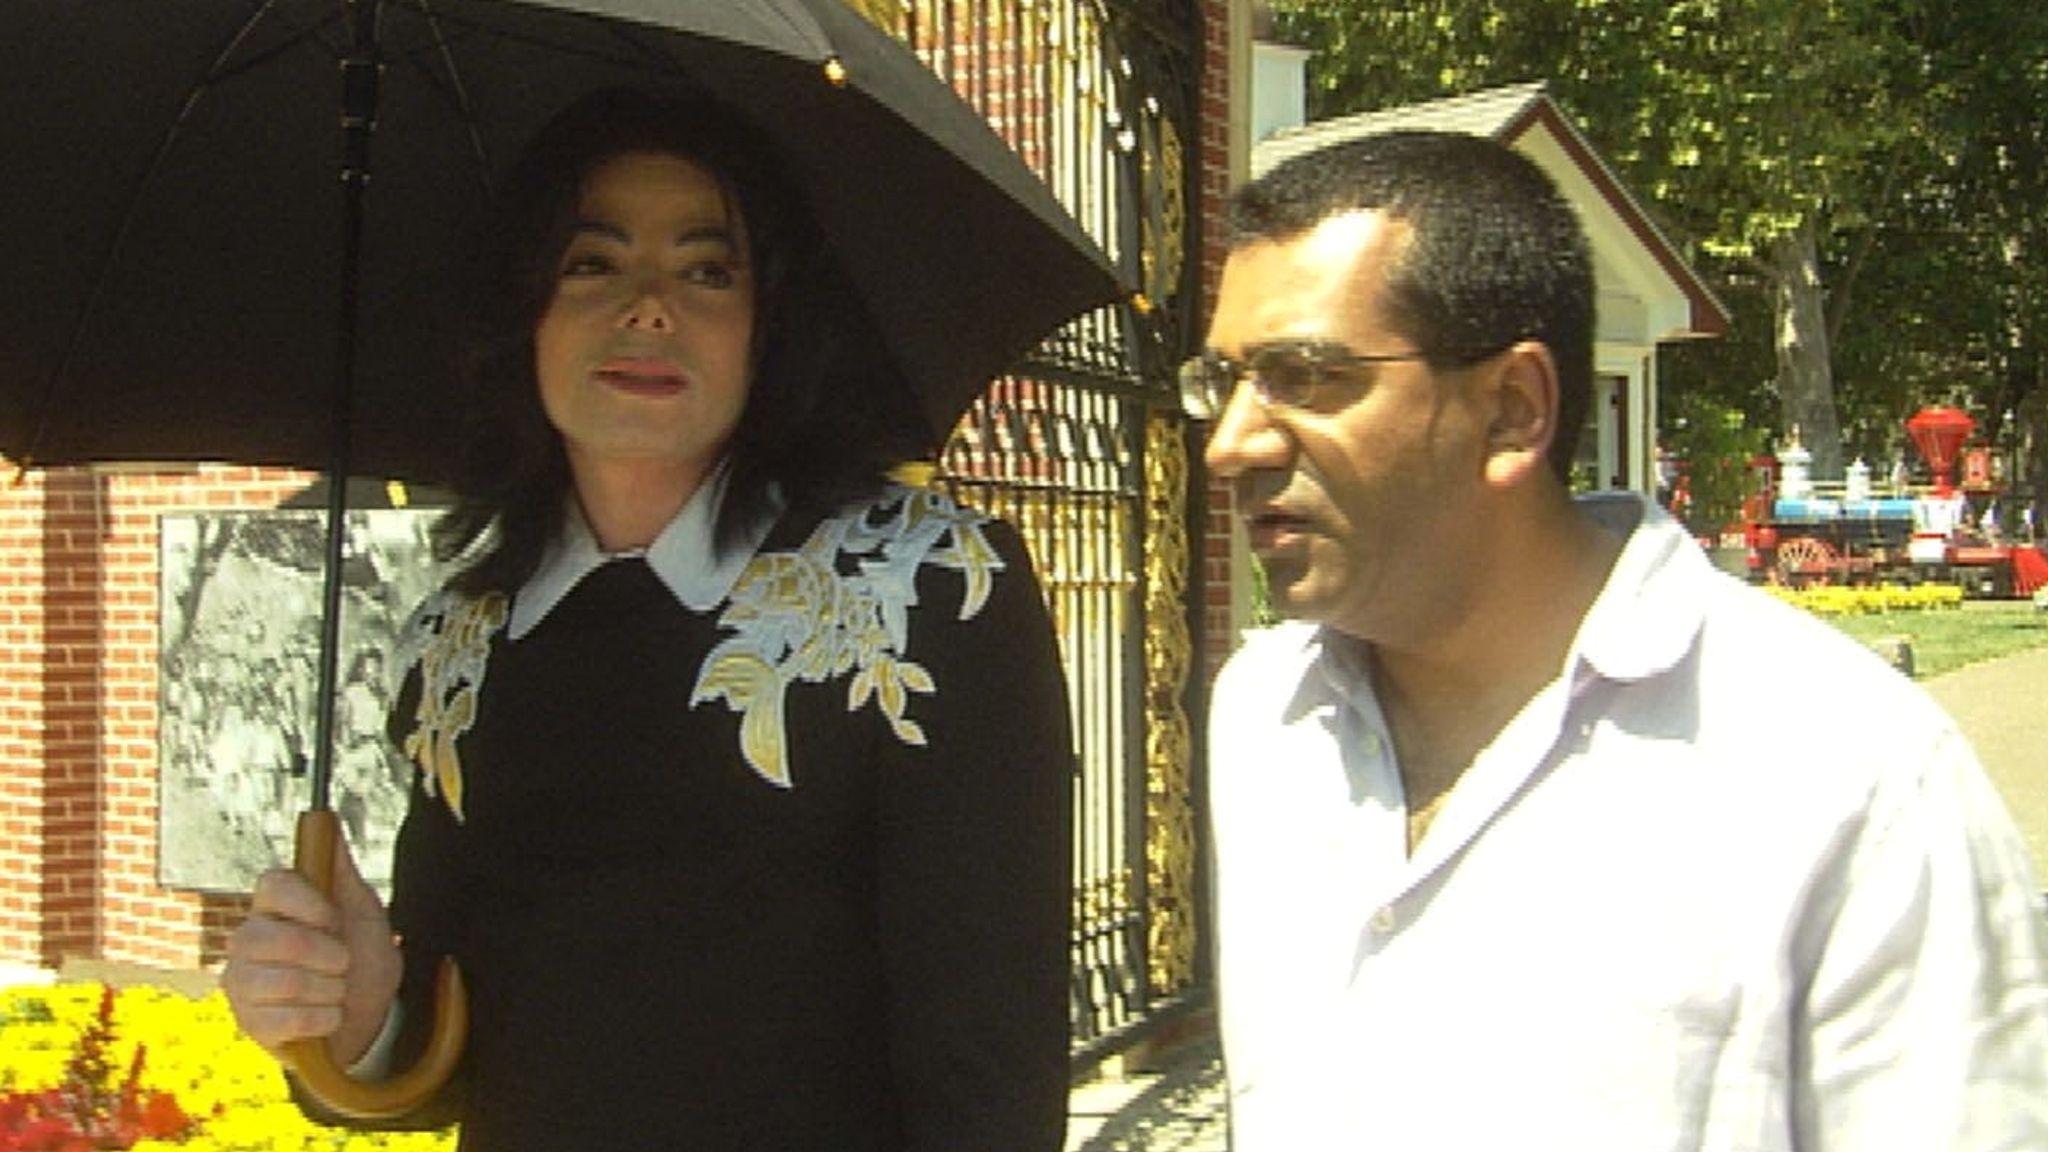 Michael Jackson and Martin Bashir. Pic: ITV/Shutterstock